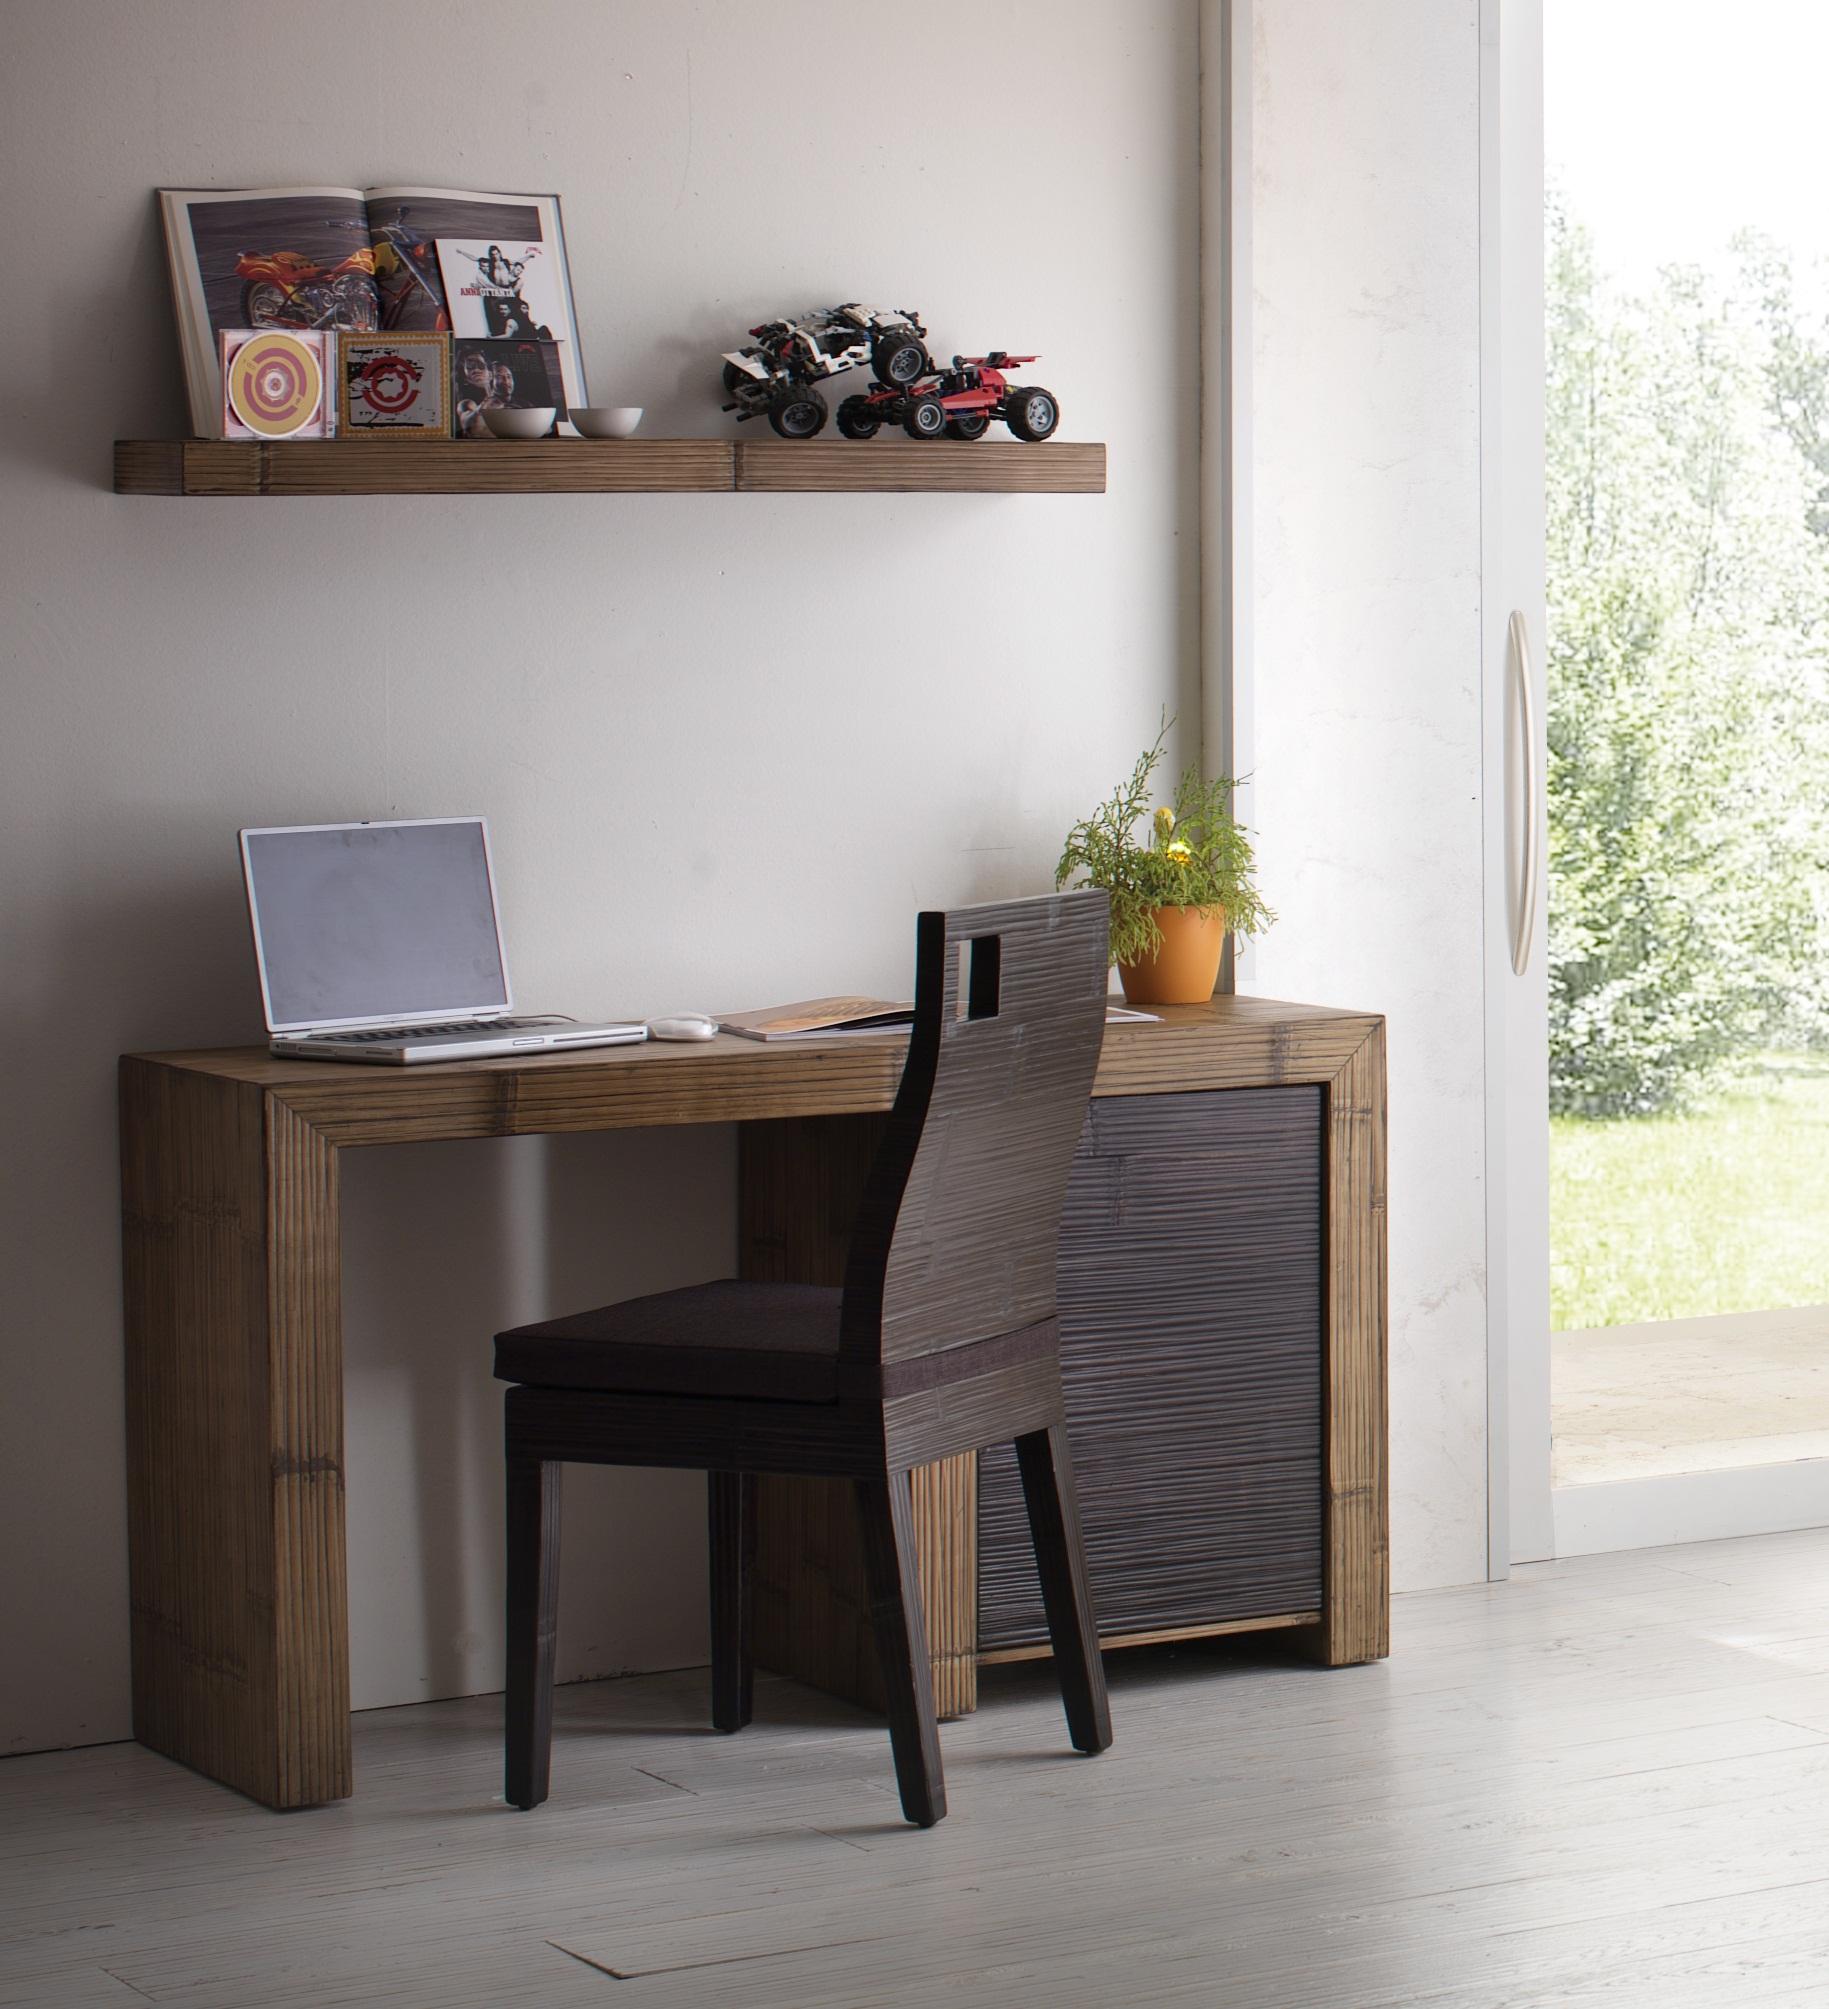 Stunning scrivania hotel with scrivania etnica for Scrivania design outlet